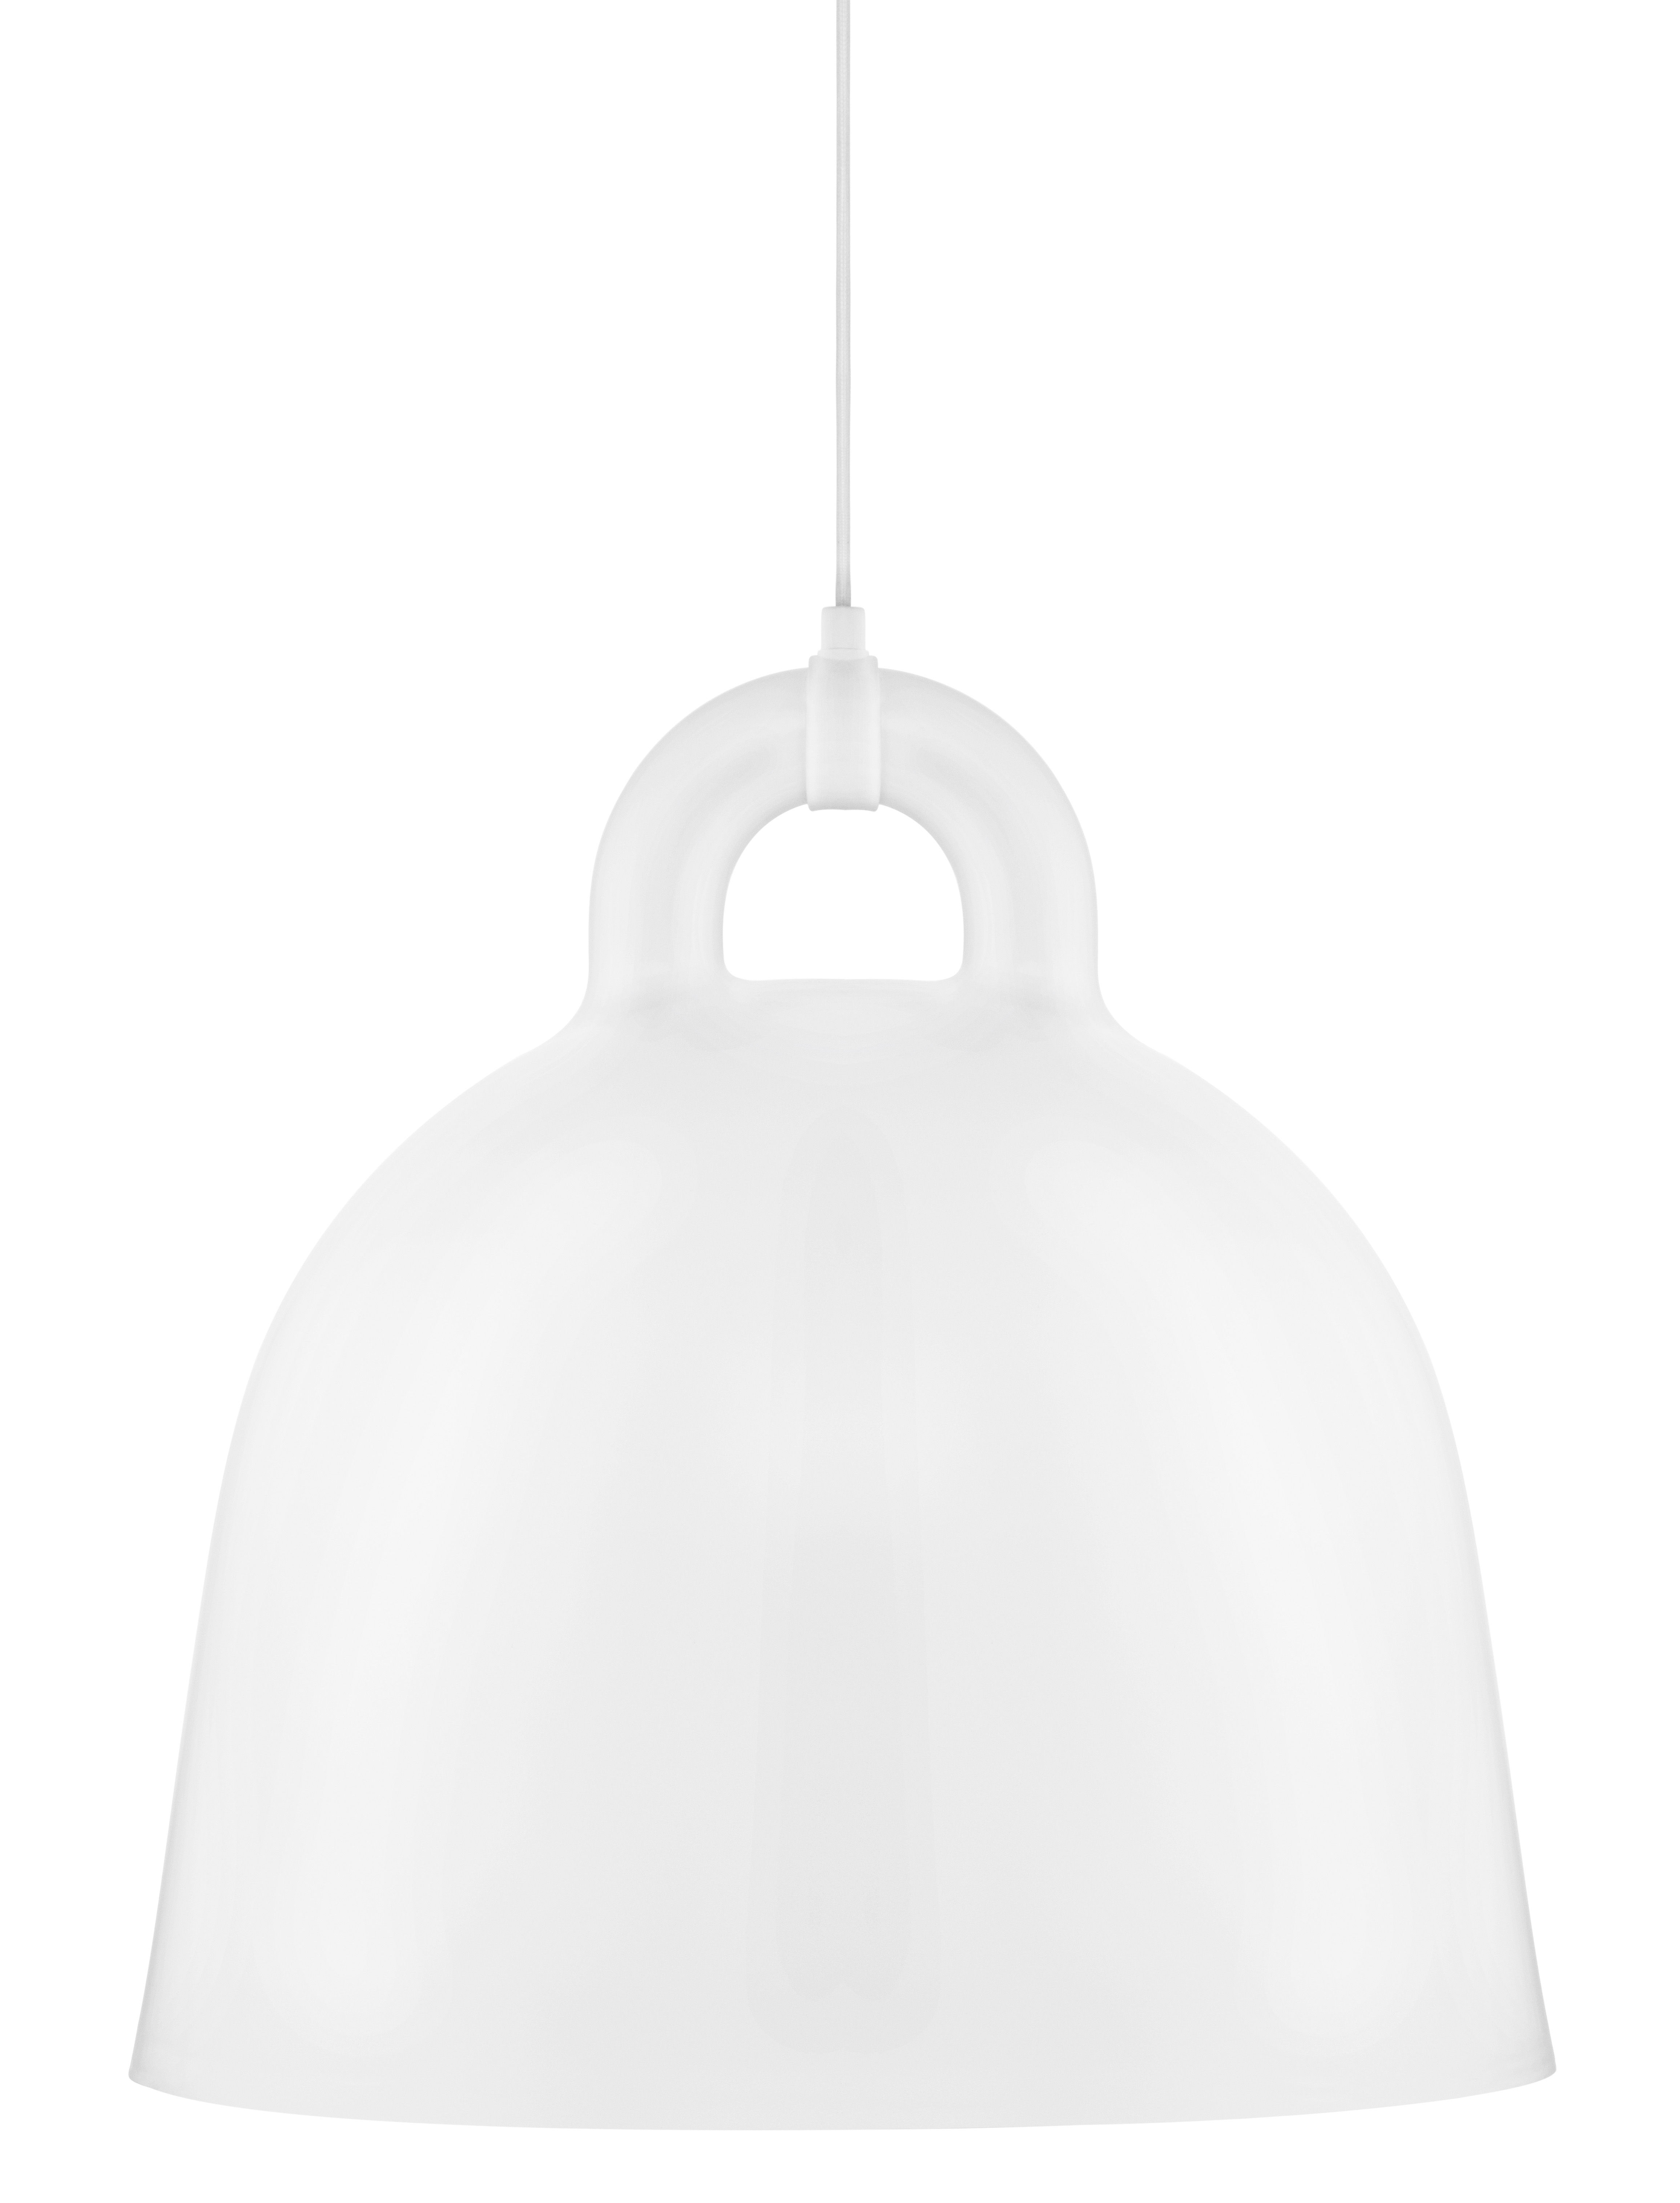 Illuminazione - Lampadari - Sospensione Bell / Large Ø 55 cm - Normann Copenhagen - Bianco opaco & Int. Bianco - Alluminio